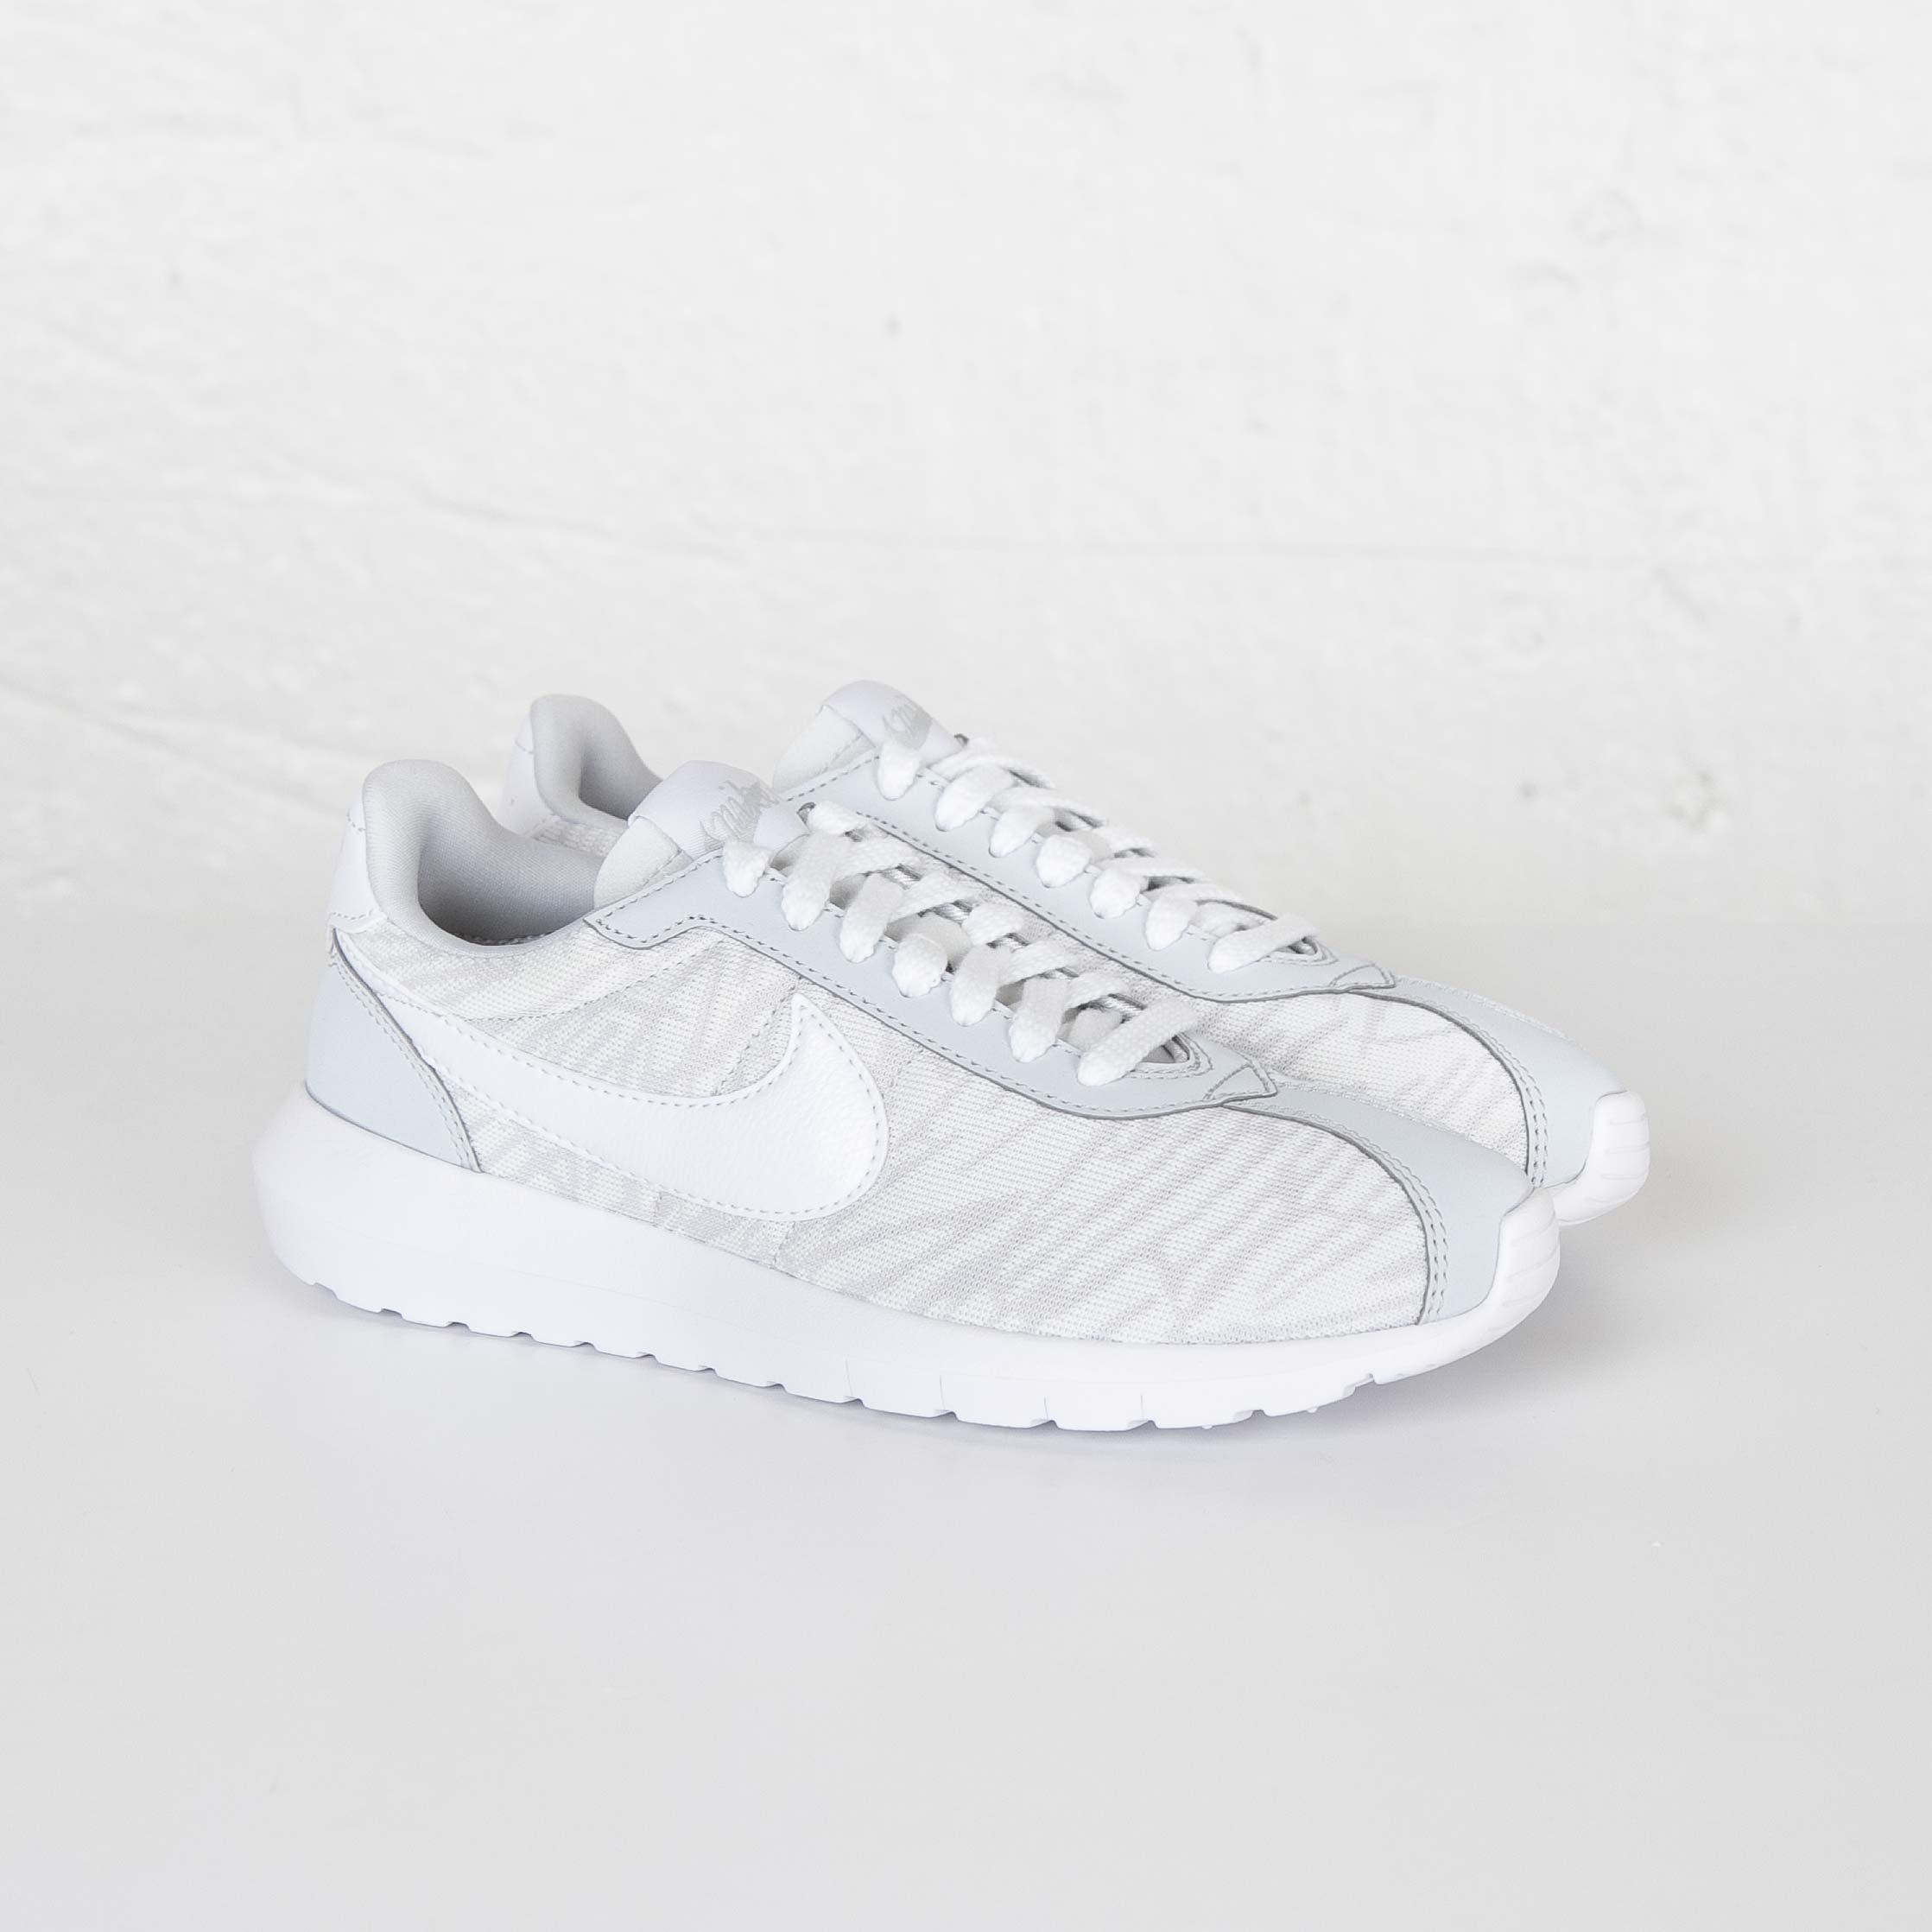 new arrival 7ec5d 2dbf0 Nike W Roshe LD-1000 Knit Jacquard